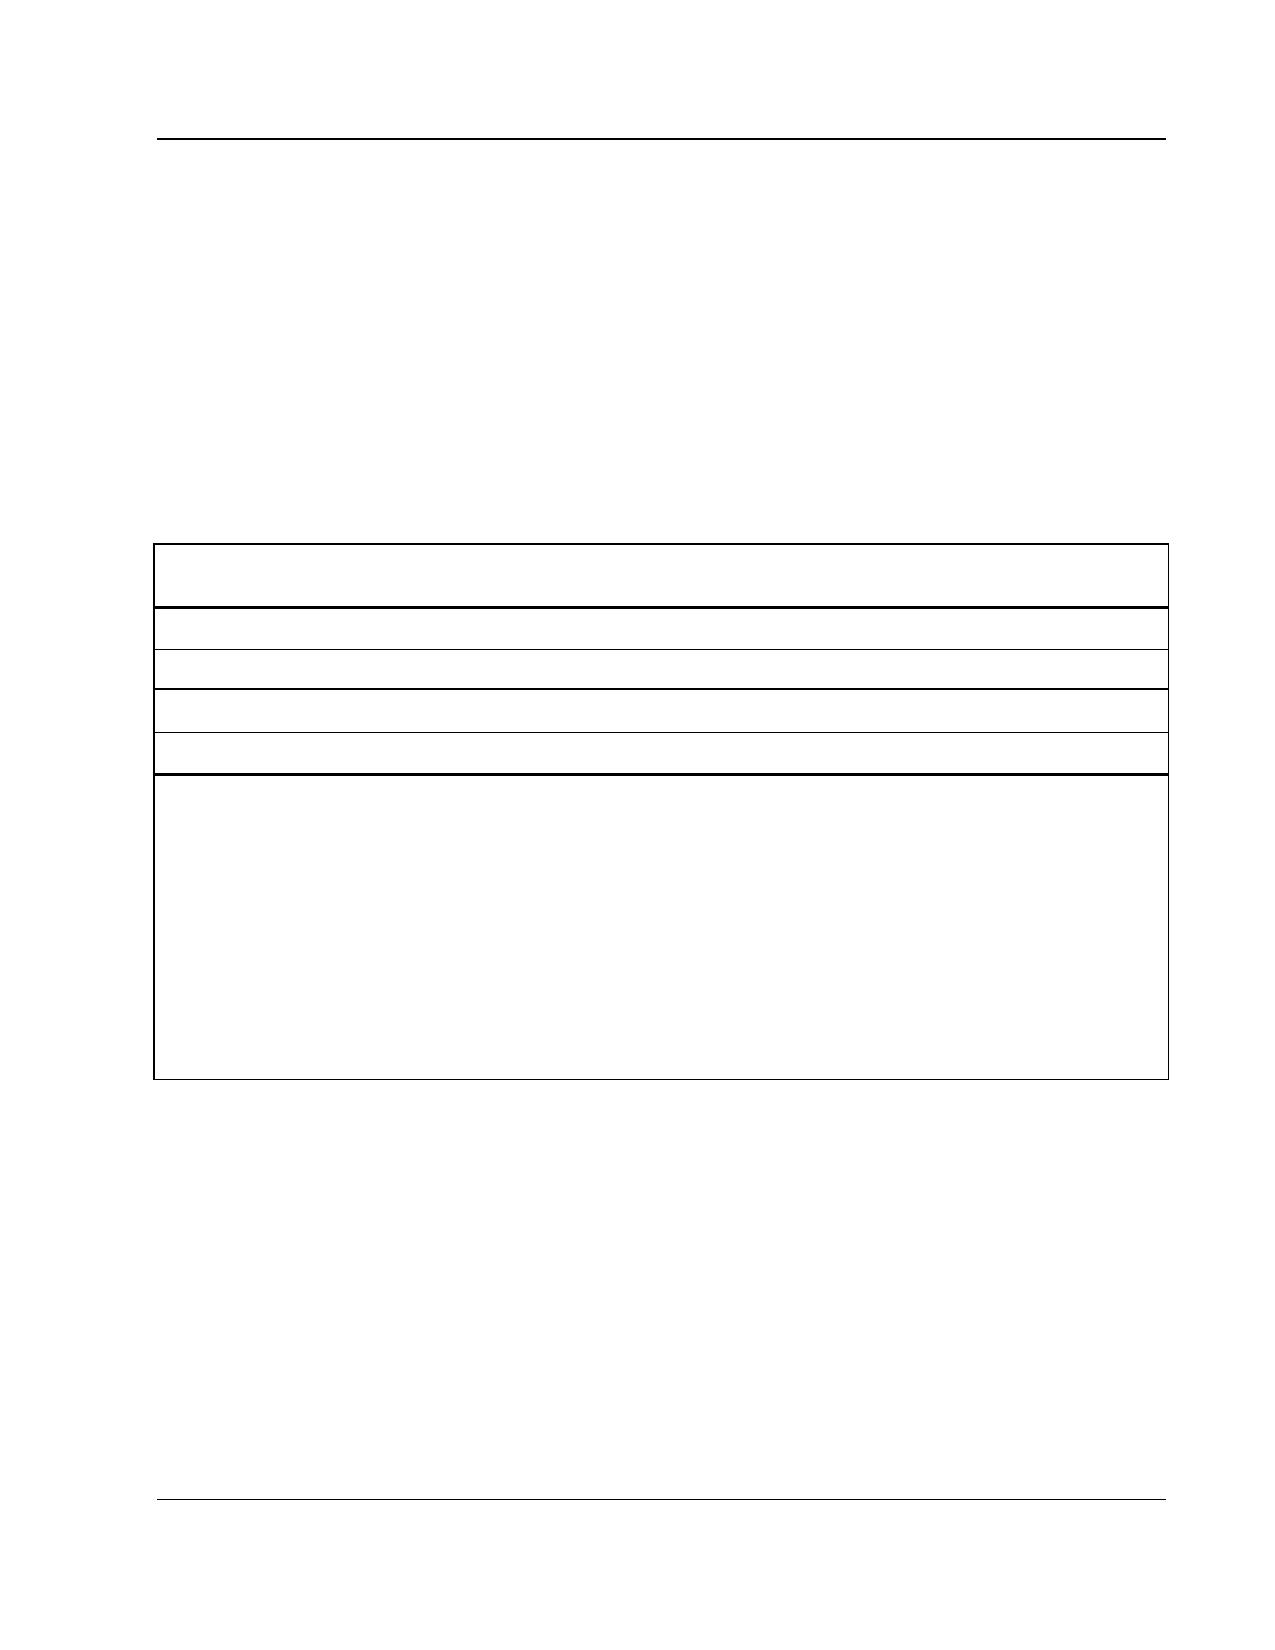 1N955 Datenblatt PDF